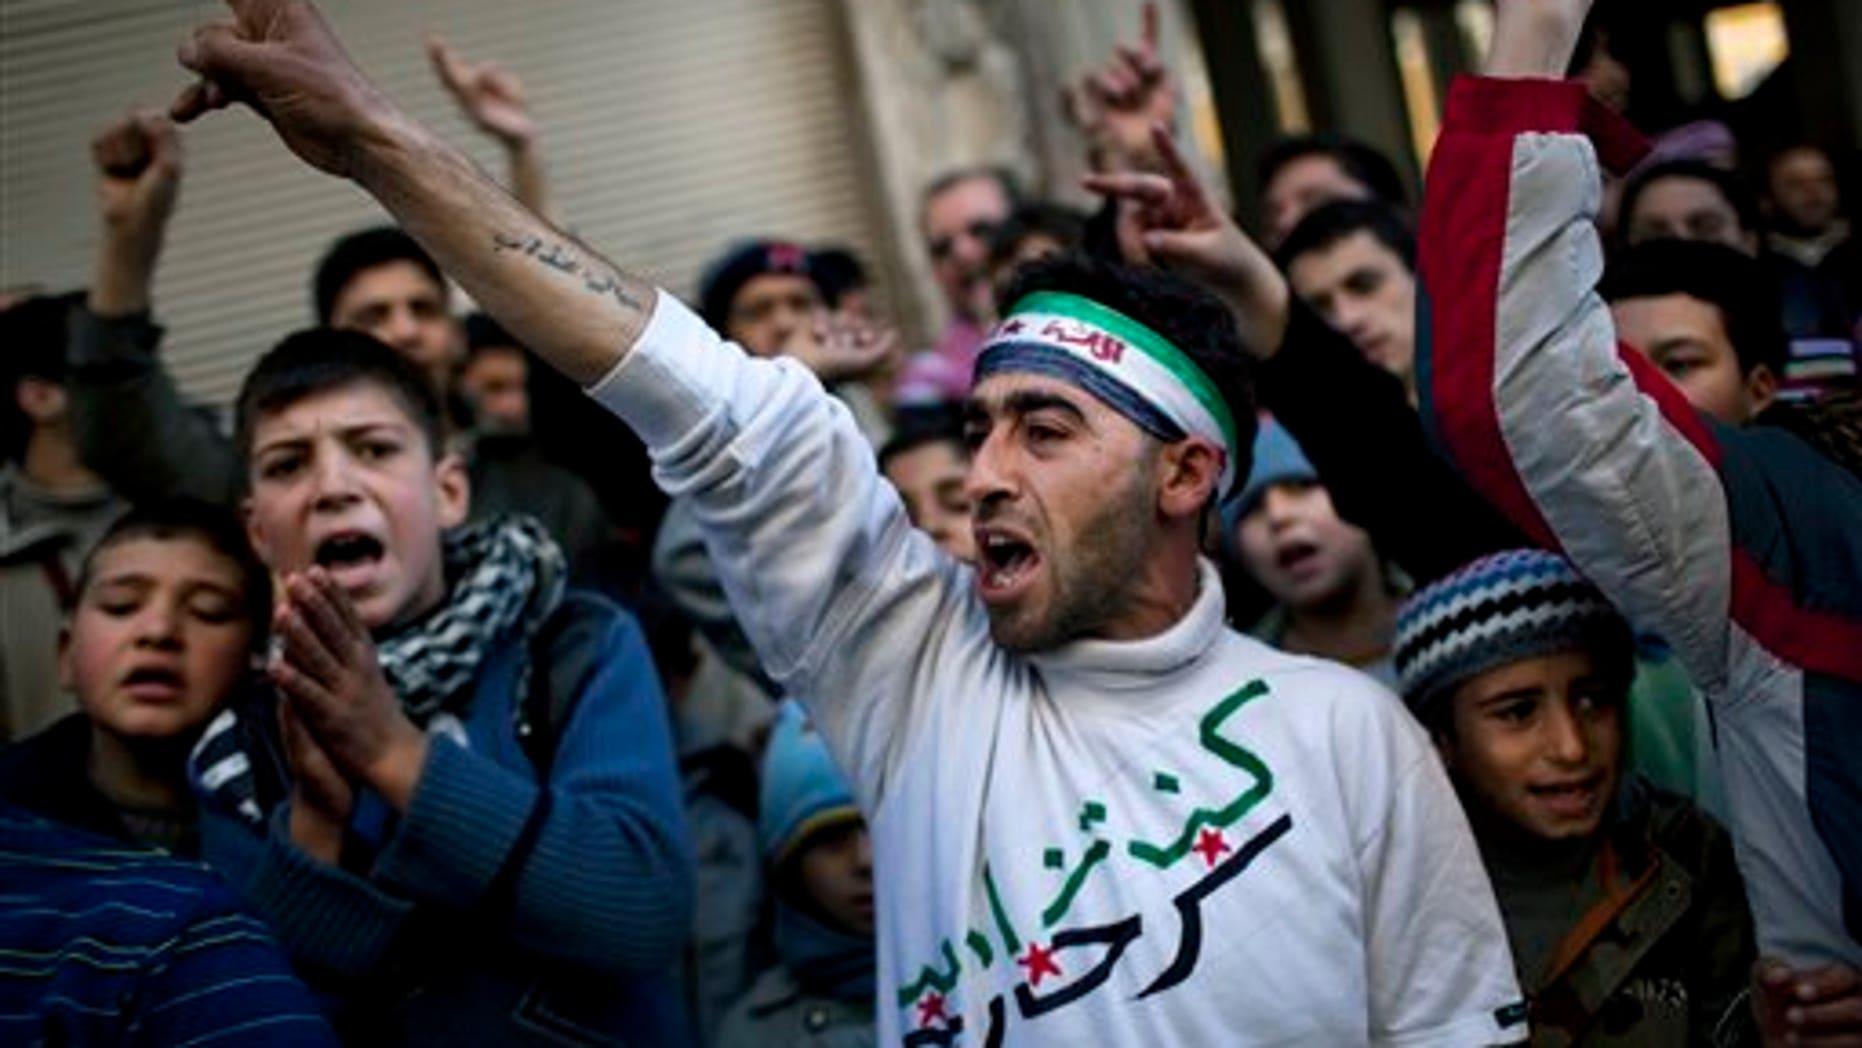 Feb. 24: People chant slogans against Syrian President Bashar Al-Assad's regime during a demonstration in Kafar Taharim, northern  Syria.